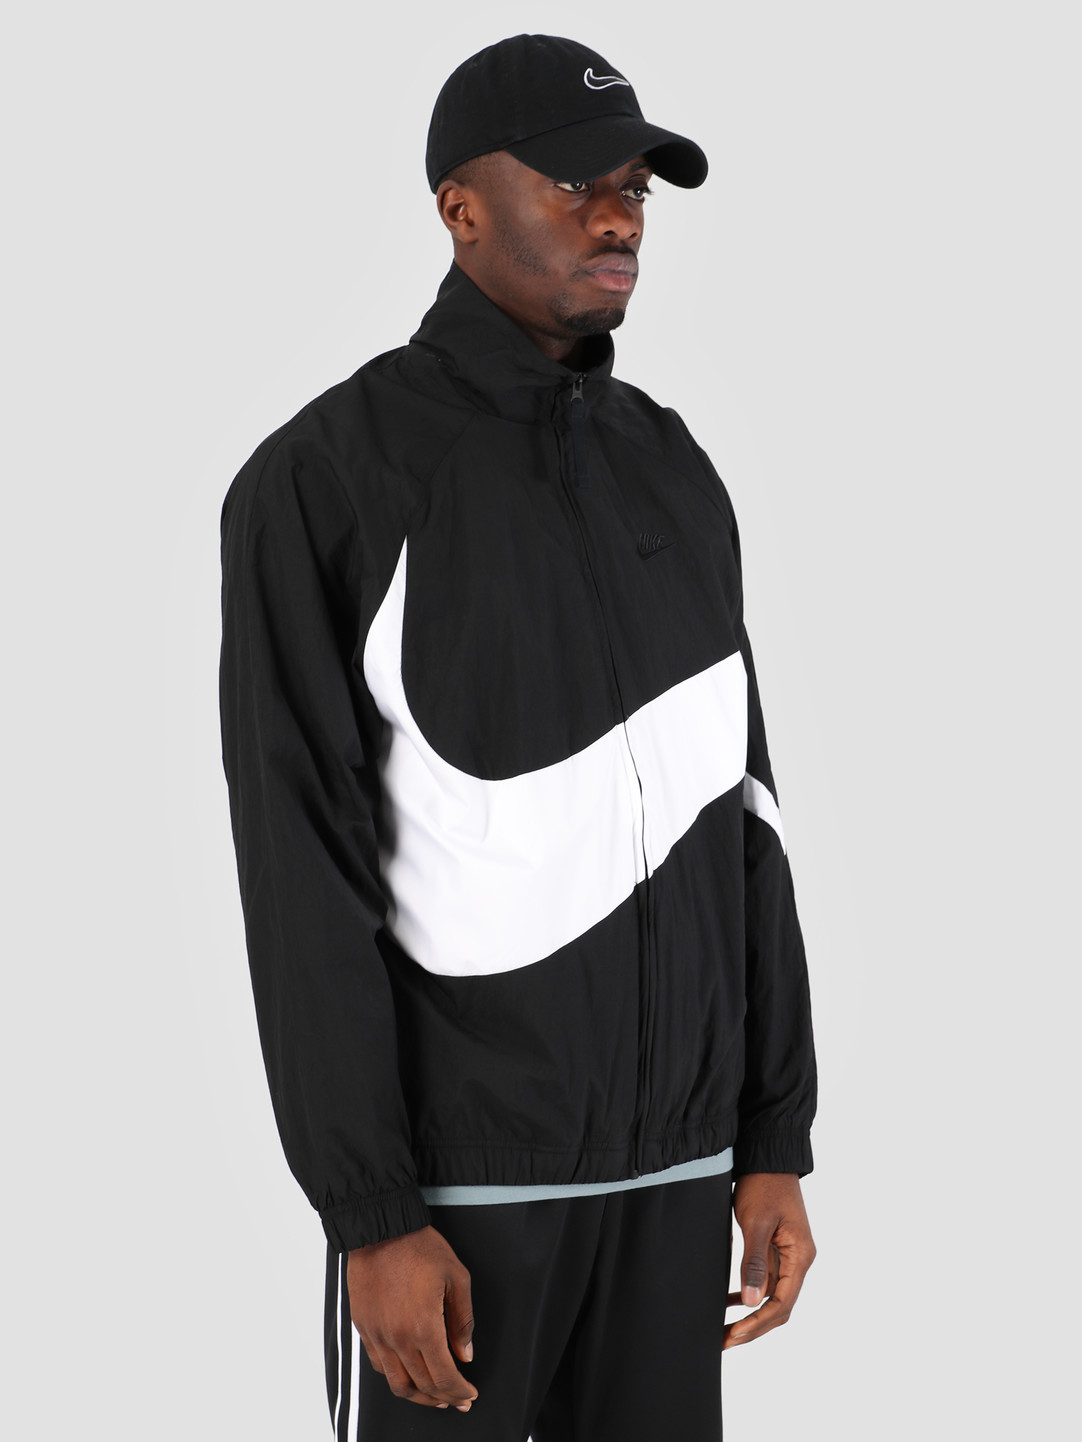 Nike Nike Sportswear Jacket Black White Black Black Ar3132-010